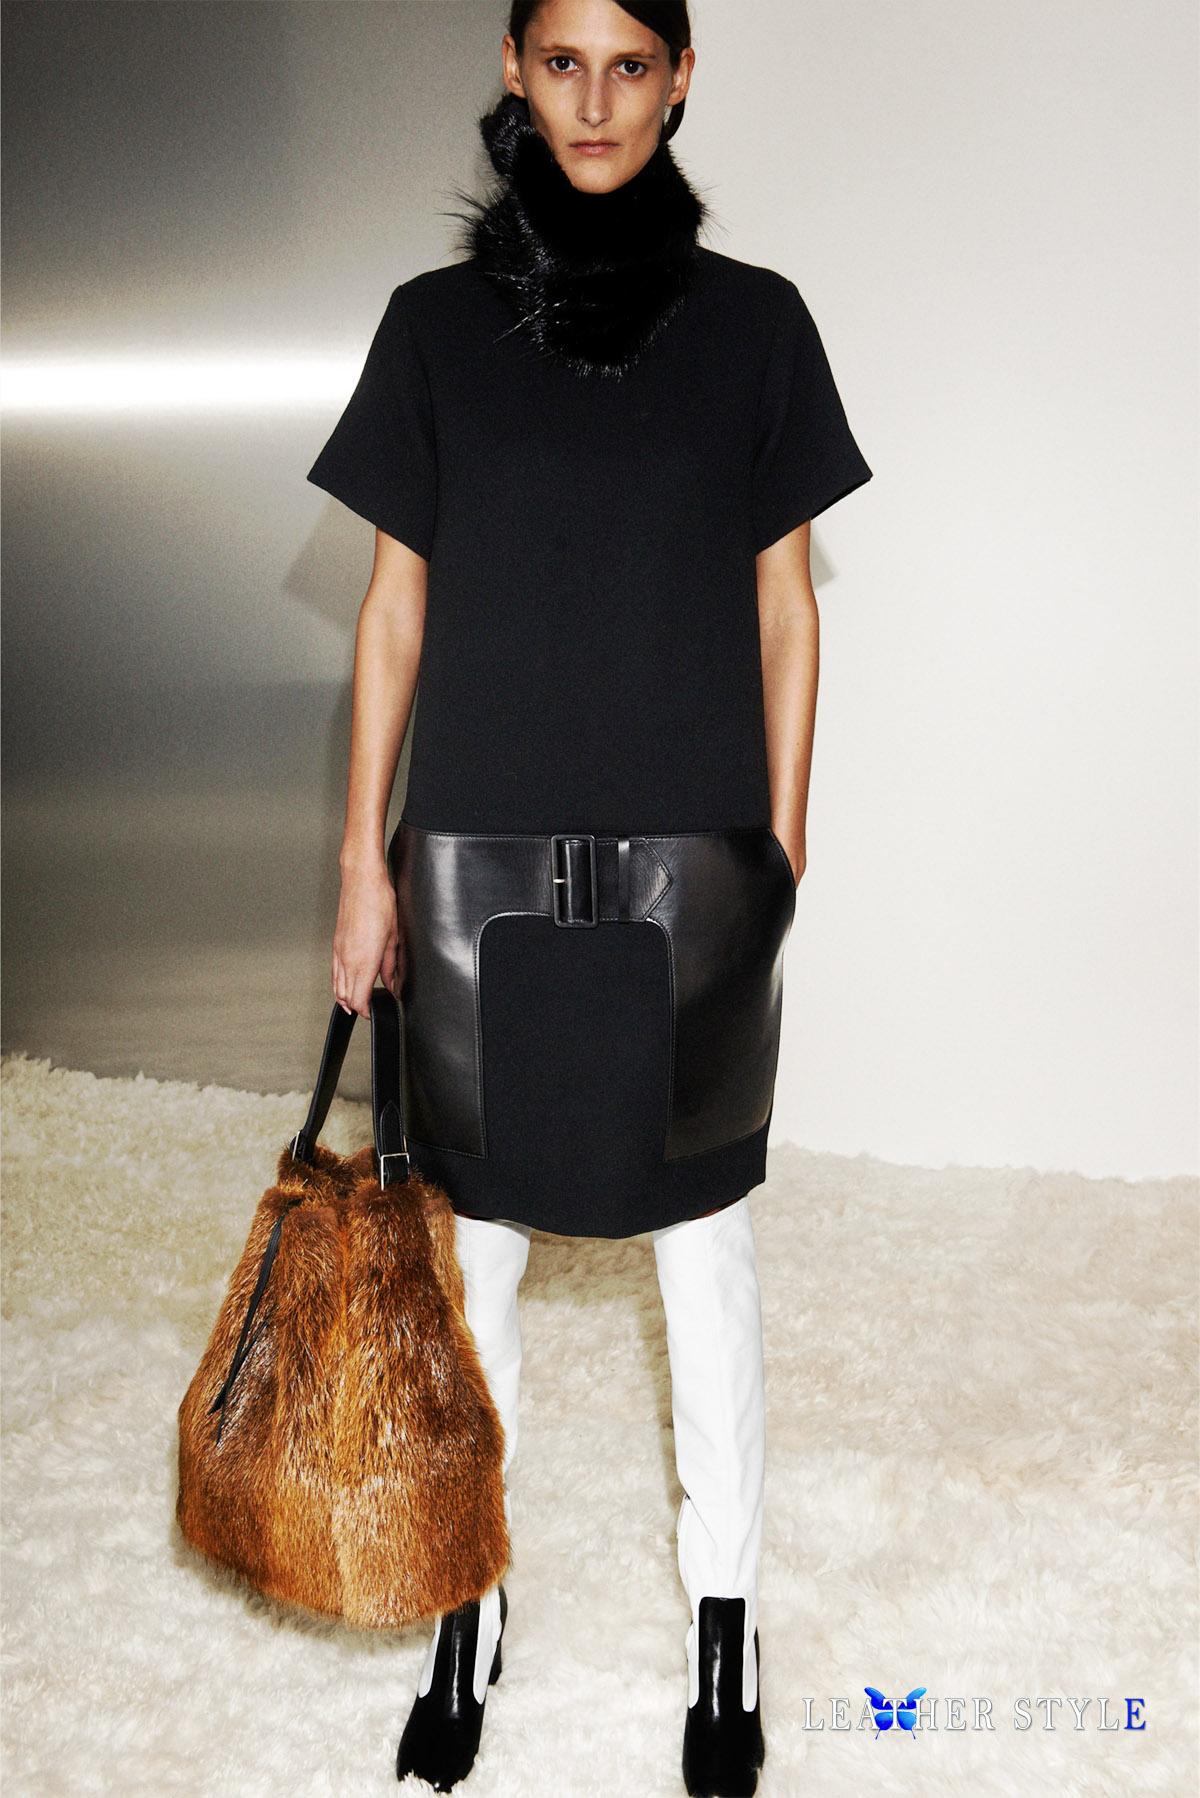 celine designer sve3  010-leather-style-designer-phoebe-philo-fashion-brand- jual celine bags